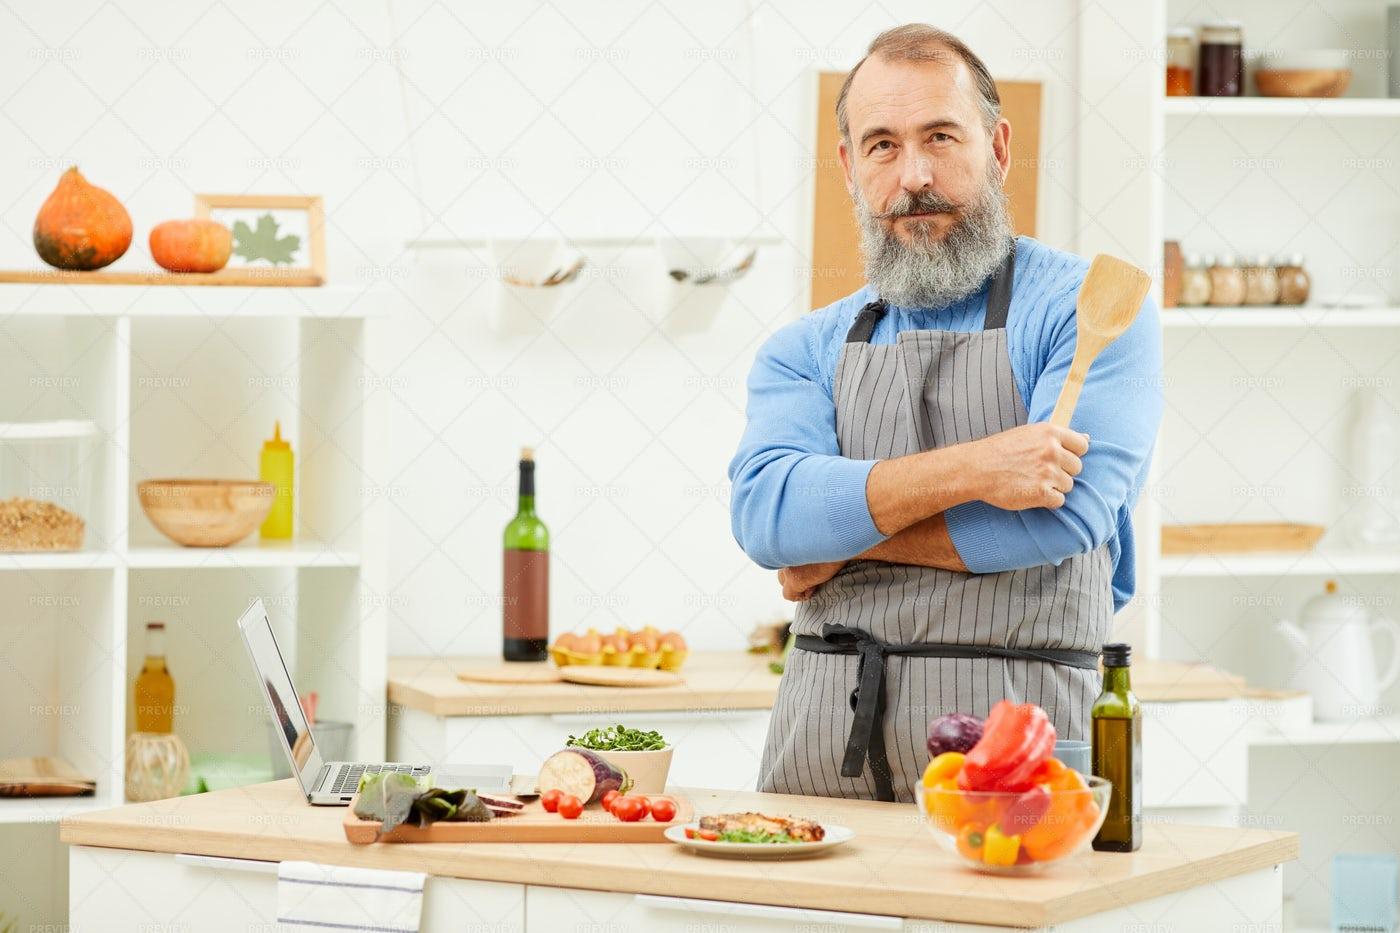 Senior Man Posing In Kitchen: Stock Photos